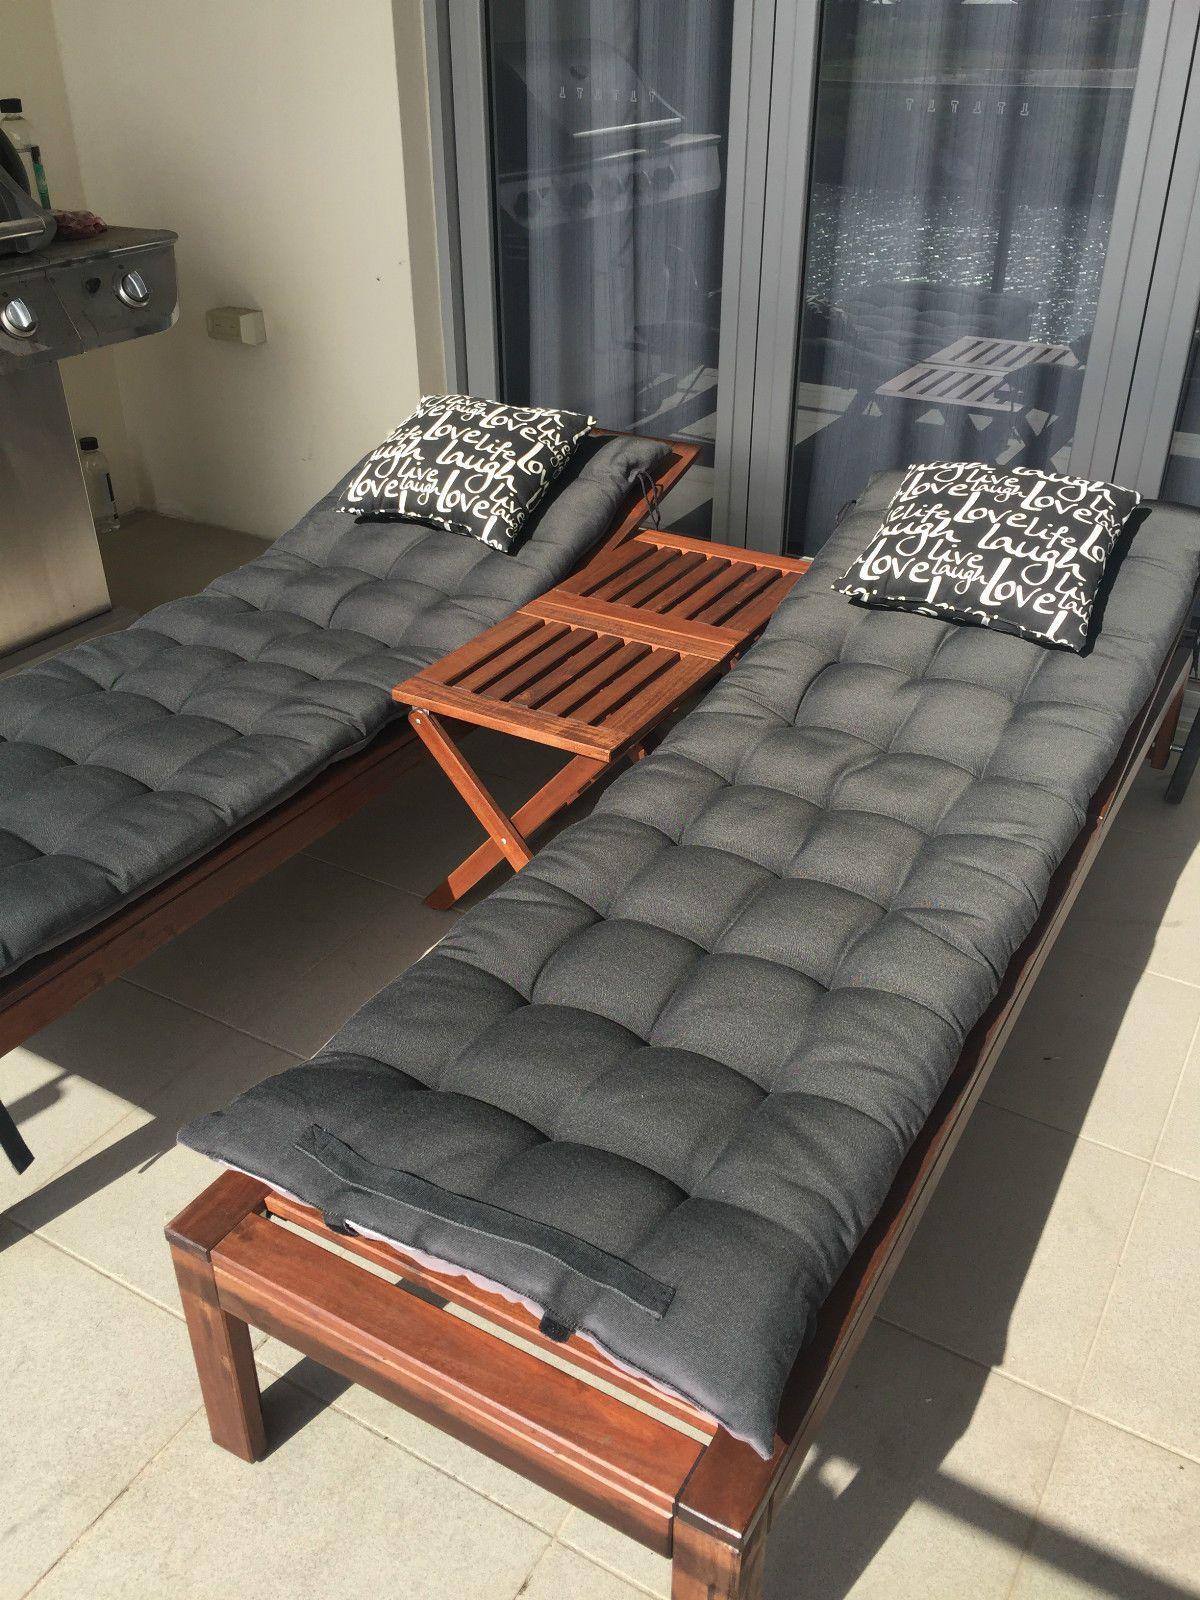 ikea set of 2 applaro acacia wood sun loungers incl bonus cushions